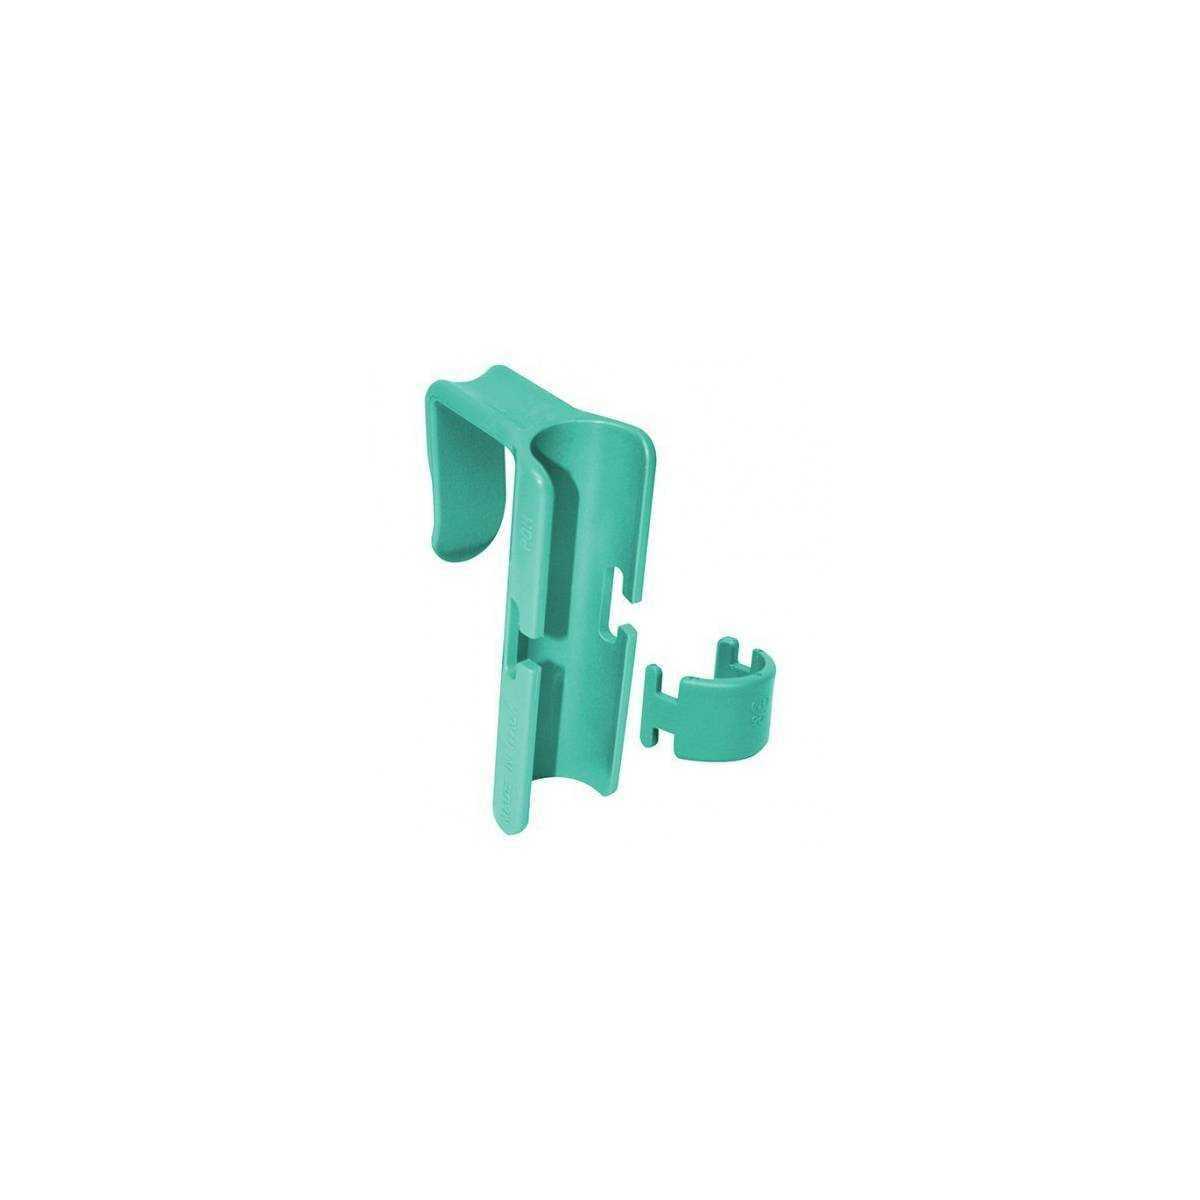 Держатель рукоятки, диаметр 26мм (3326) 3326 TTS